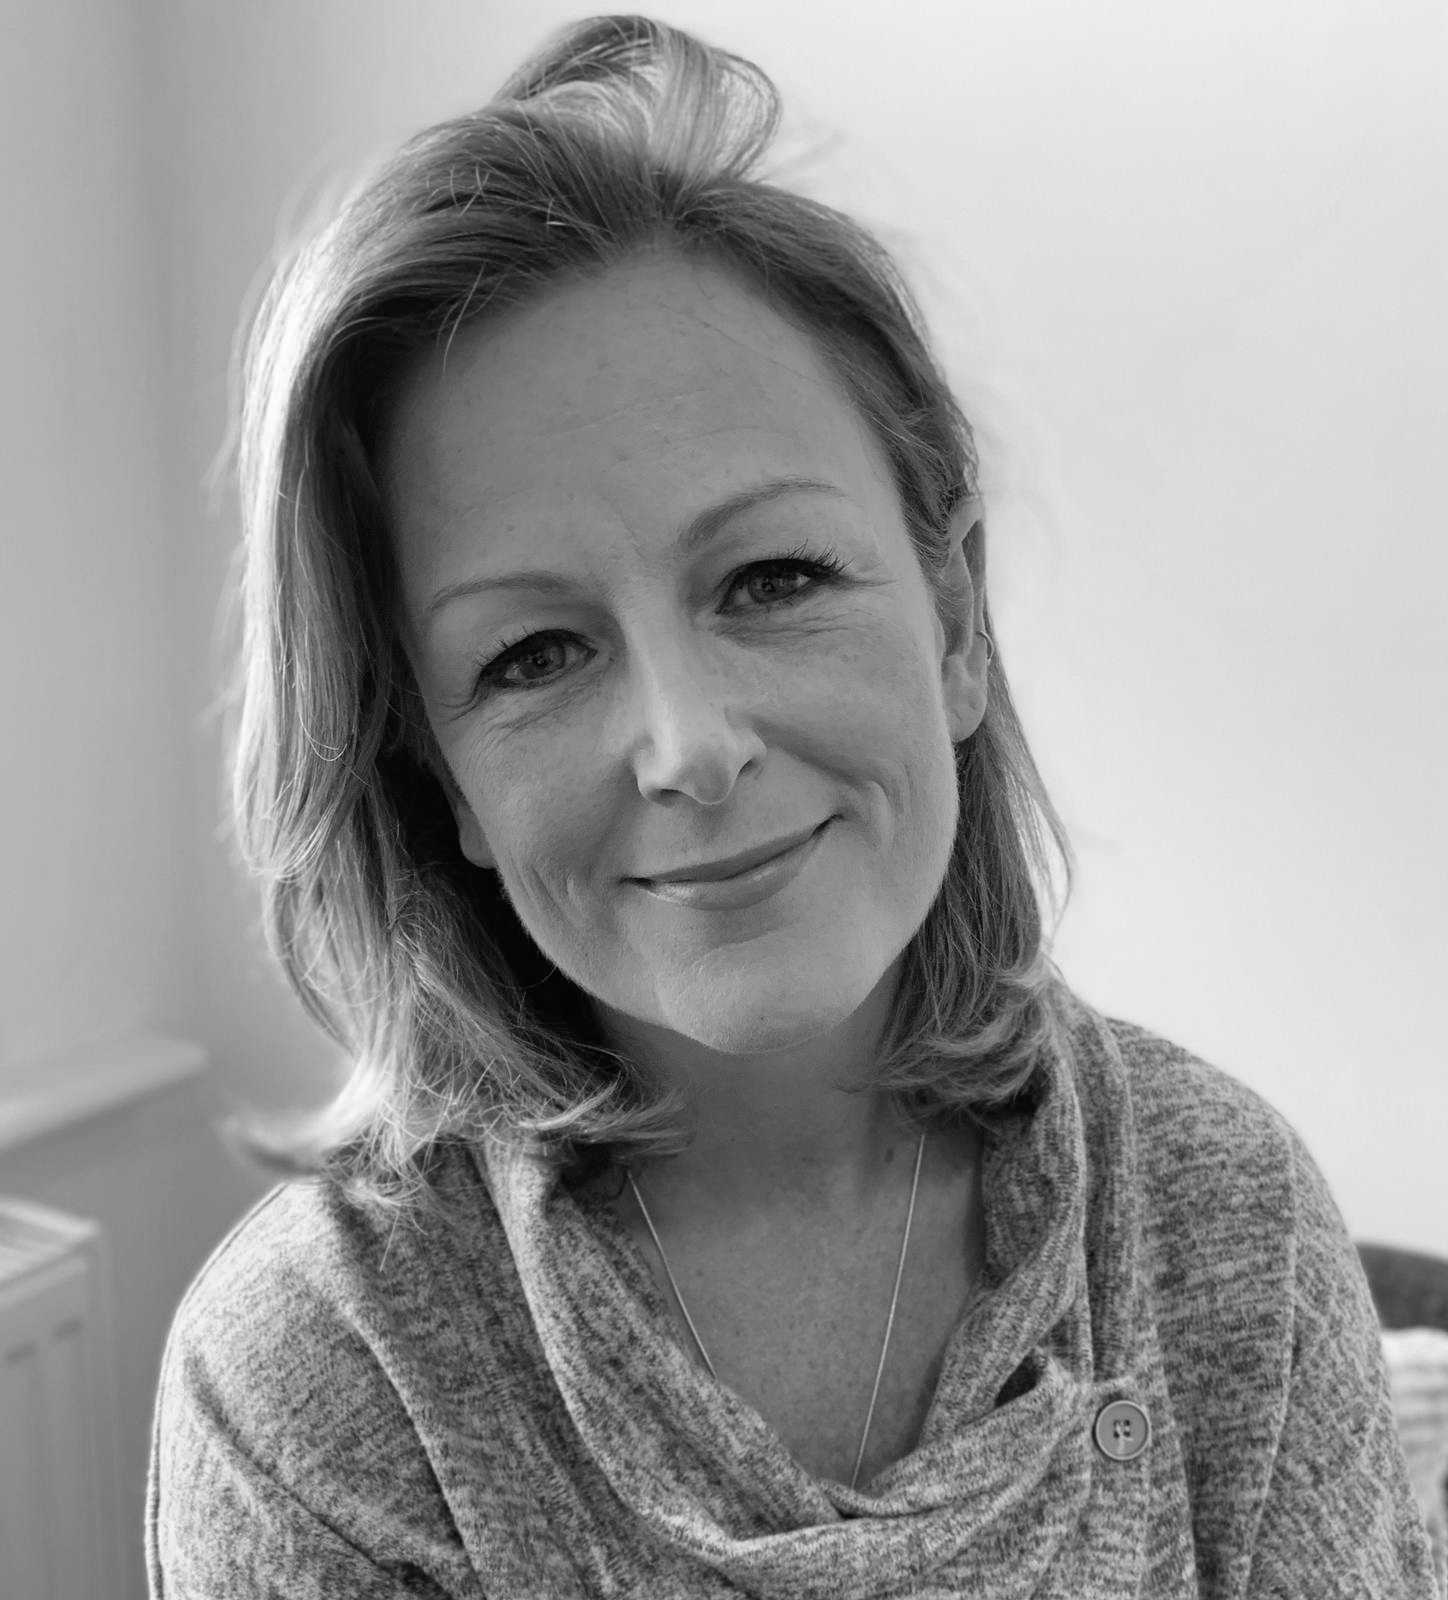 Alison Greenaway